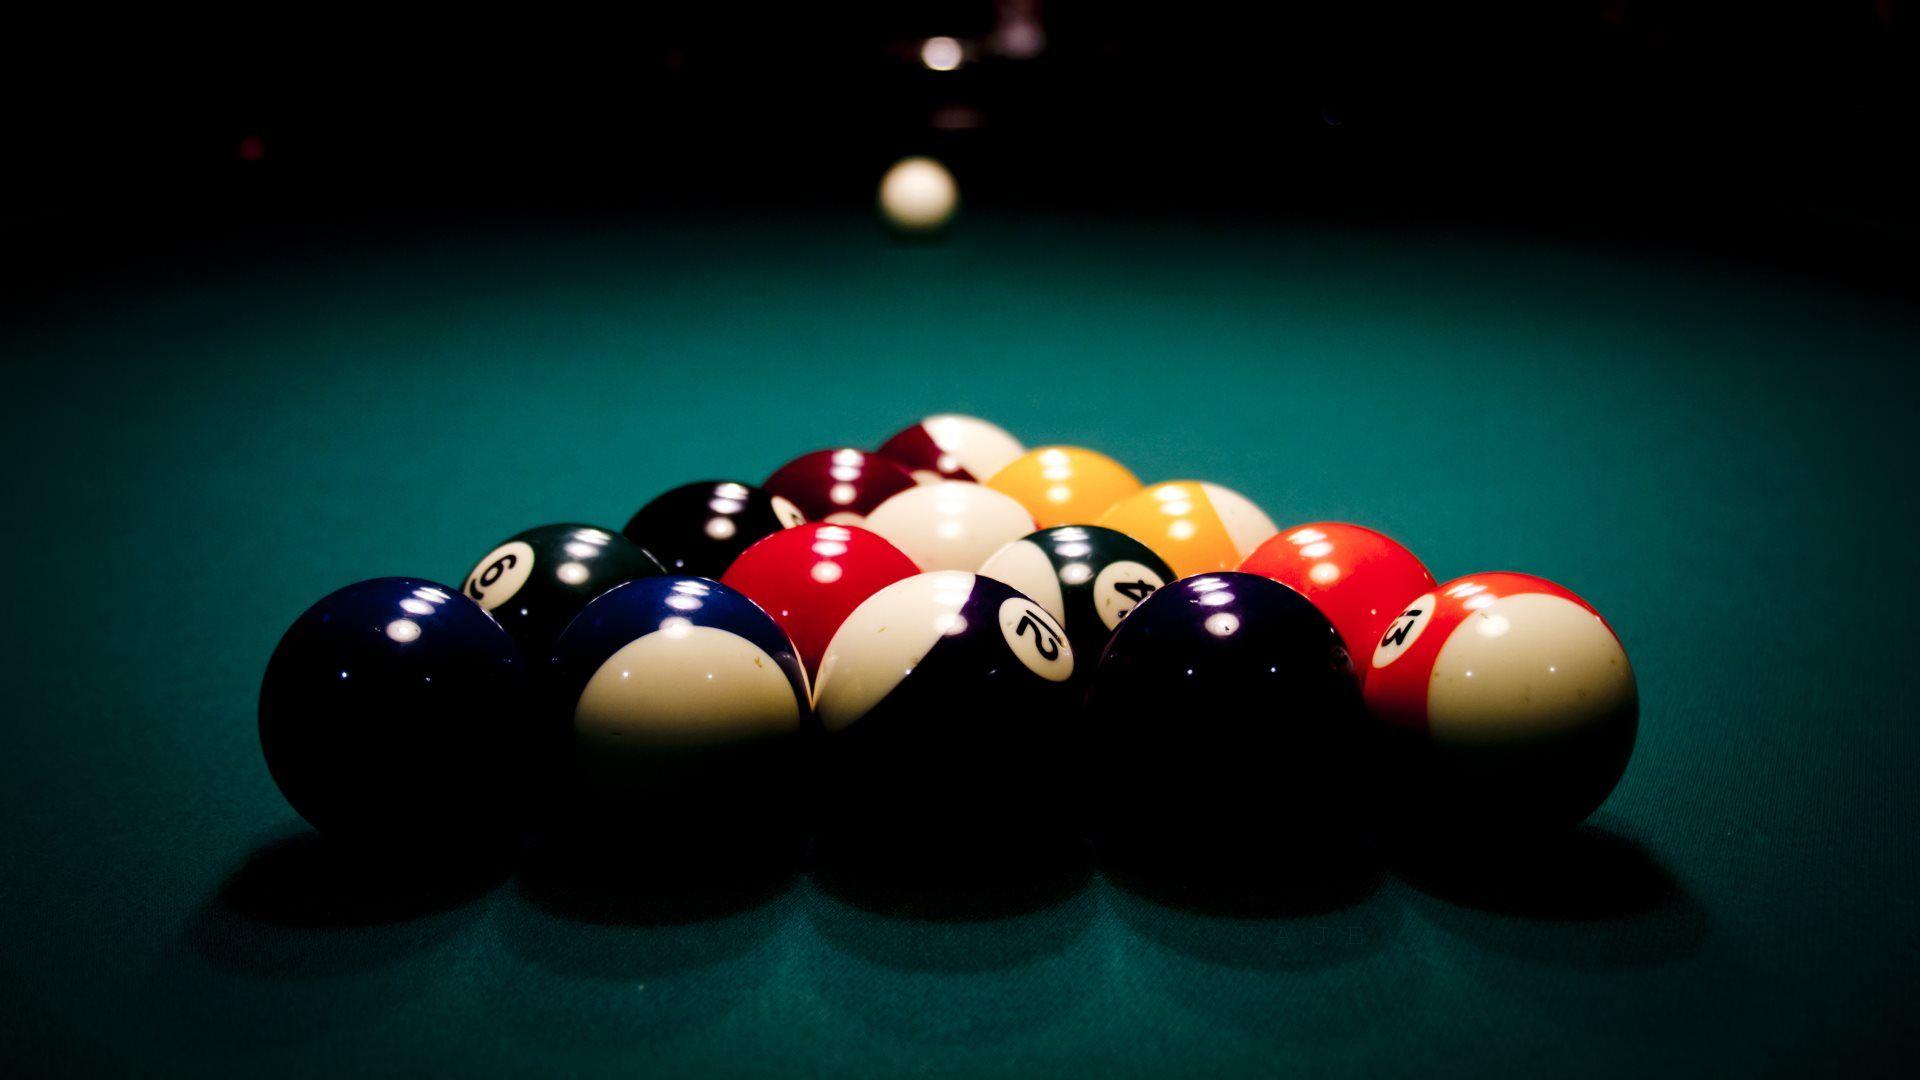 Snooker And Pool Wallpapers · 4K HD Desktop Backgrounds